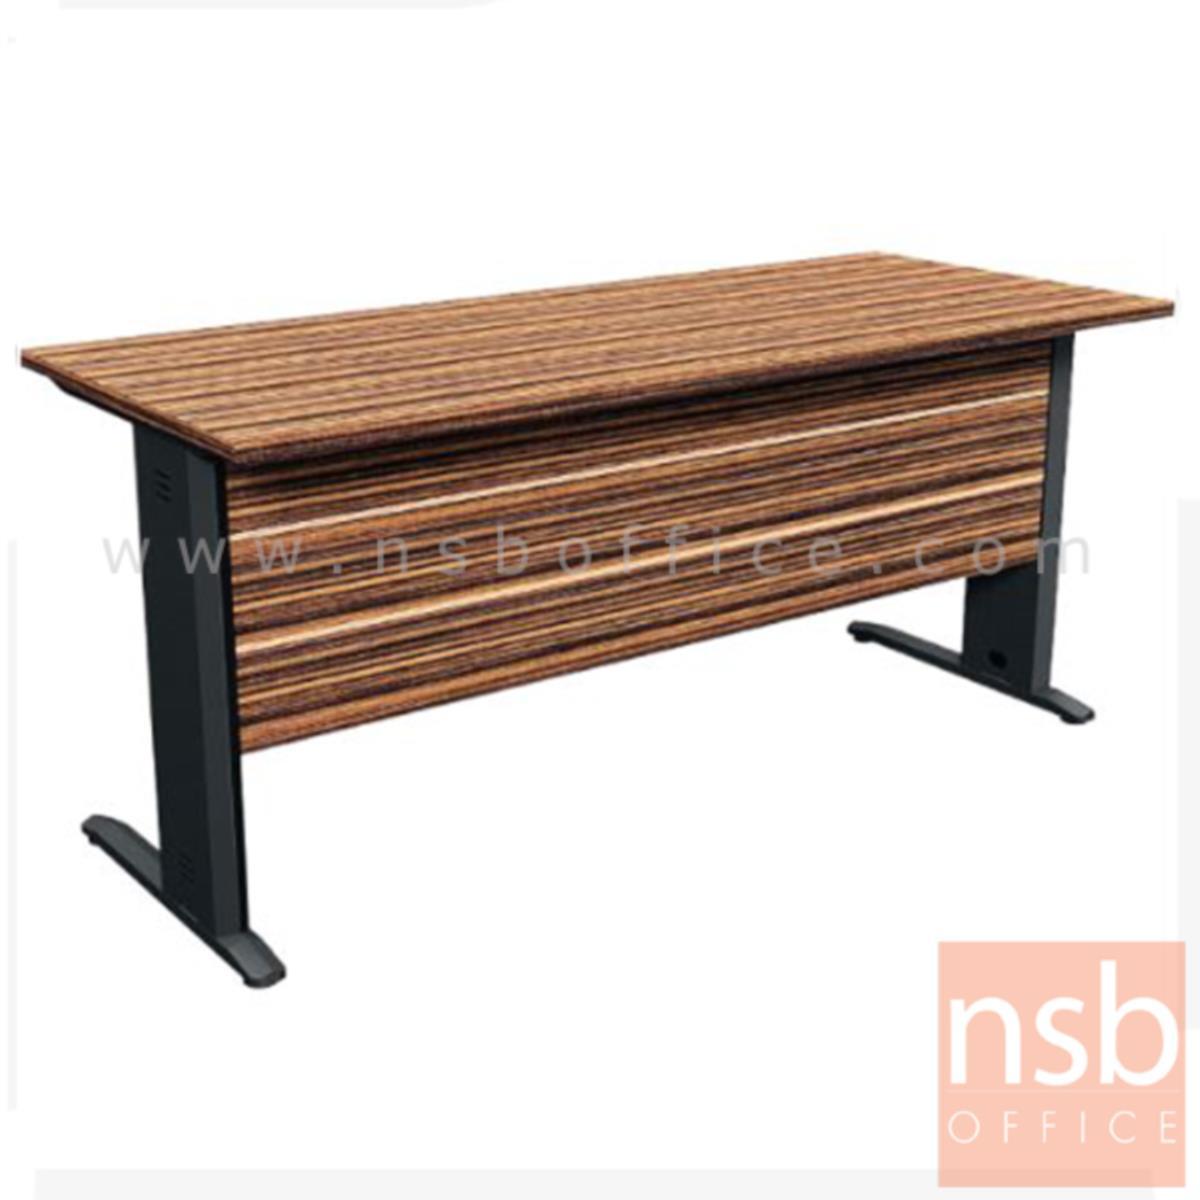 A26A027:โต๊ะทำงาน รุ่น Petally (เพทอลลี่) ขนาด 160W ,180W cm.  ขาเหล็ก สีลายไม้ซีบราโน่ตัดดำ ขอบ ROSEGOLD